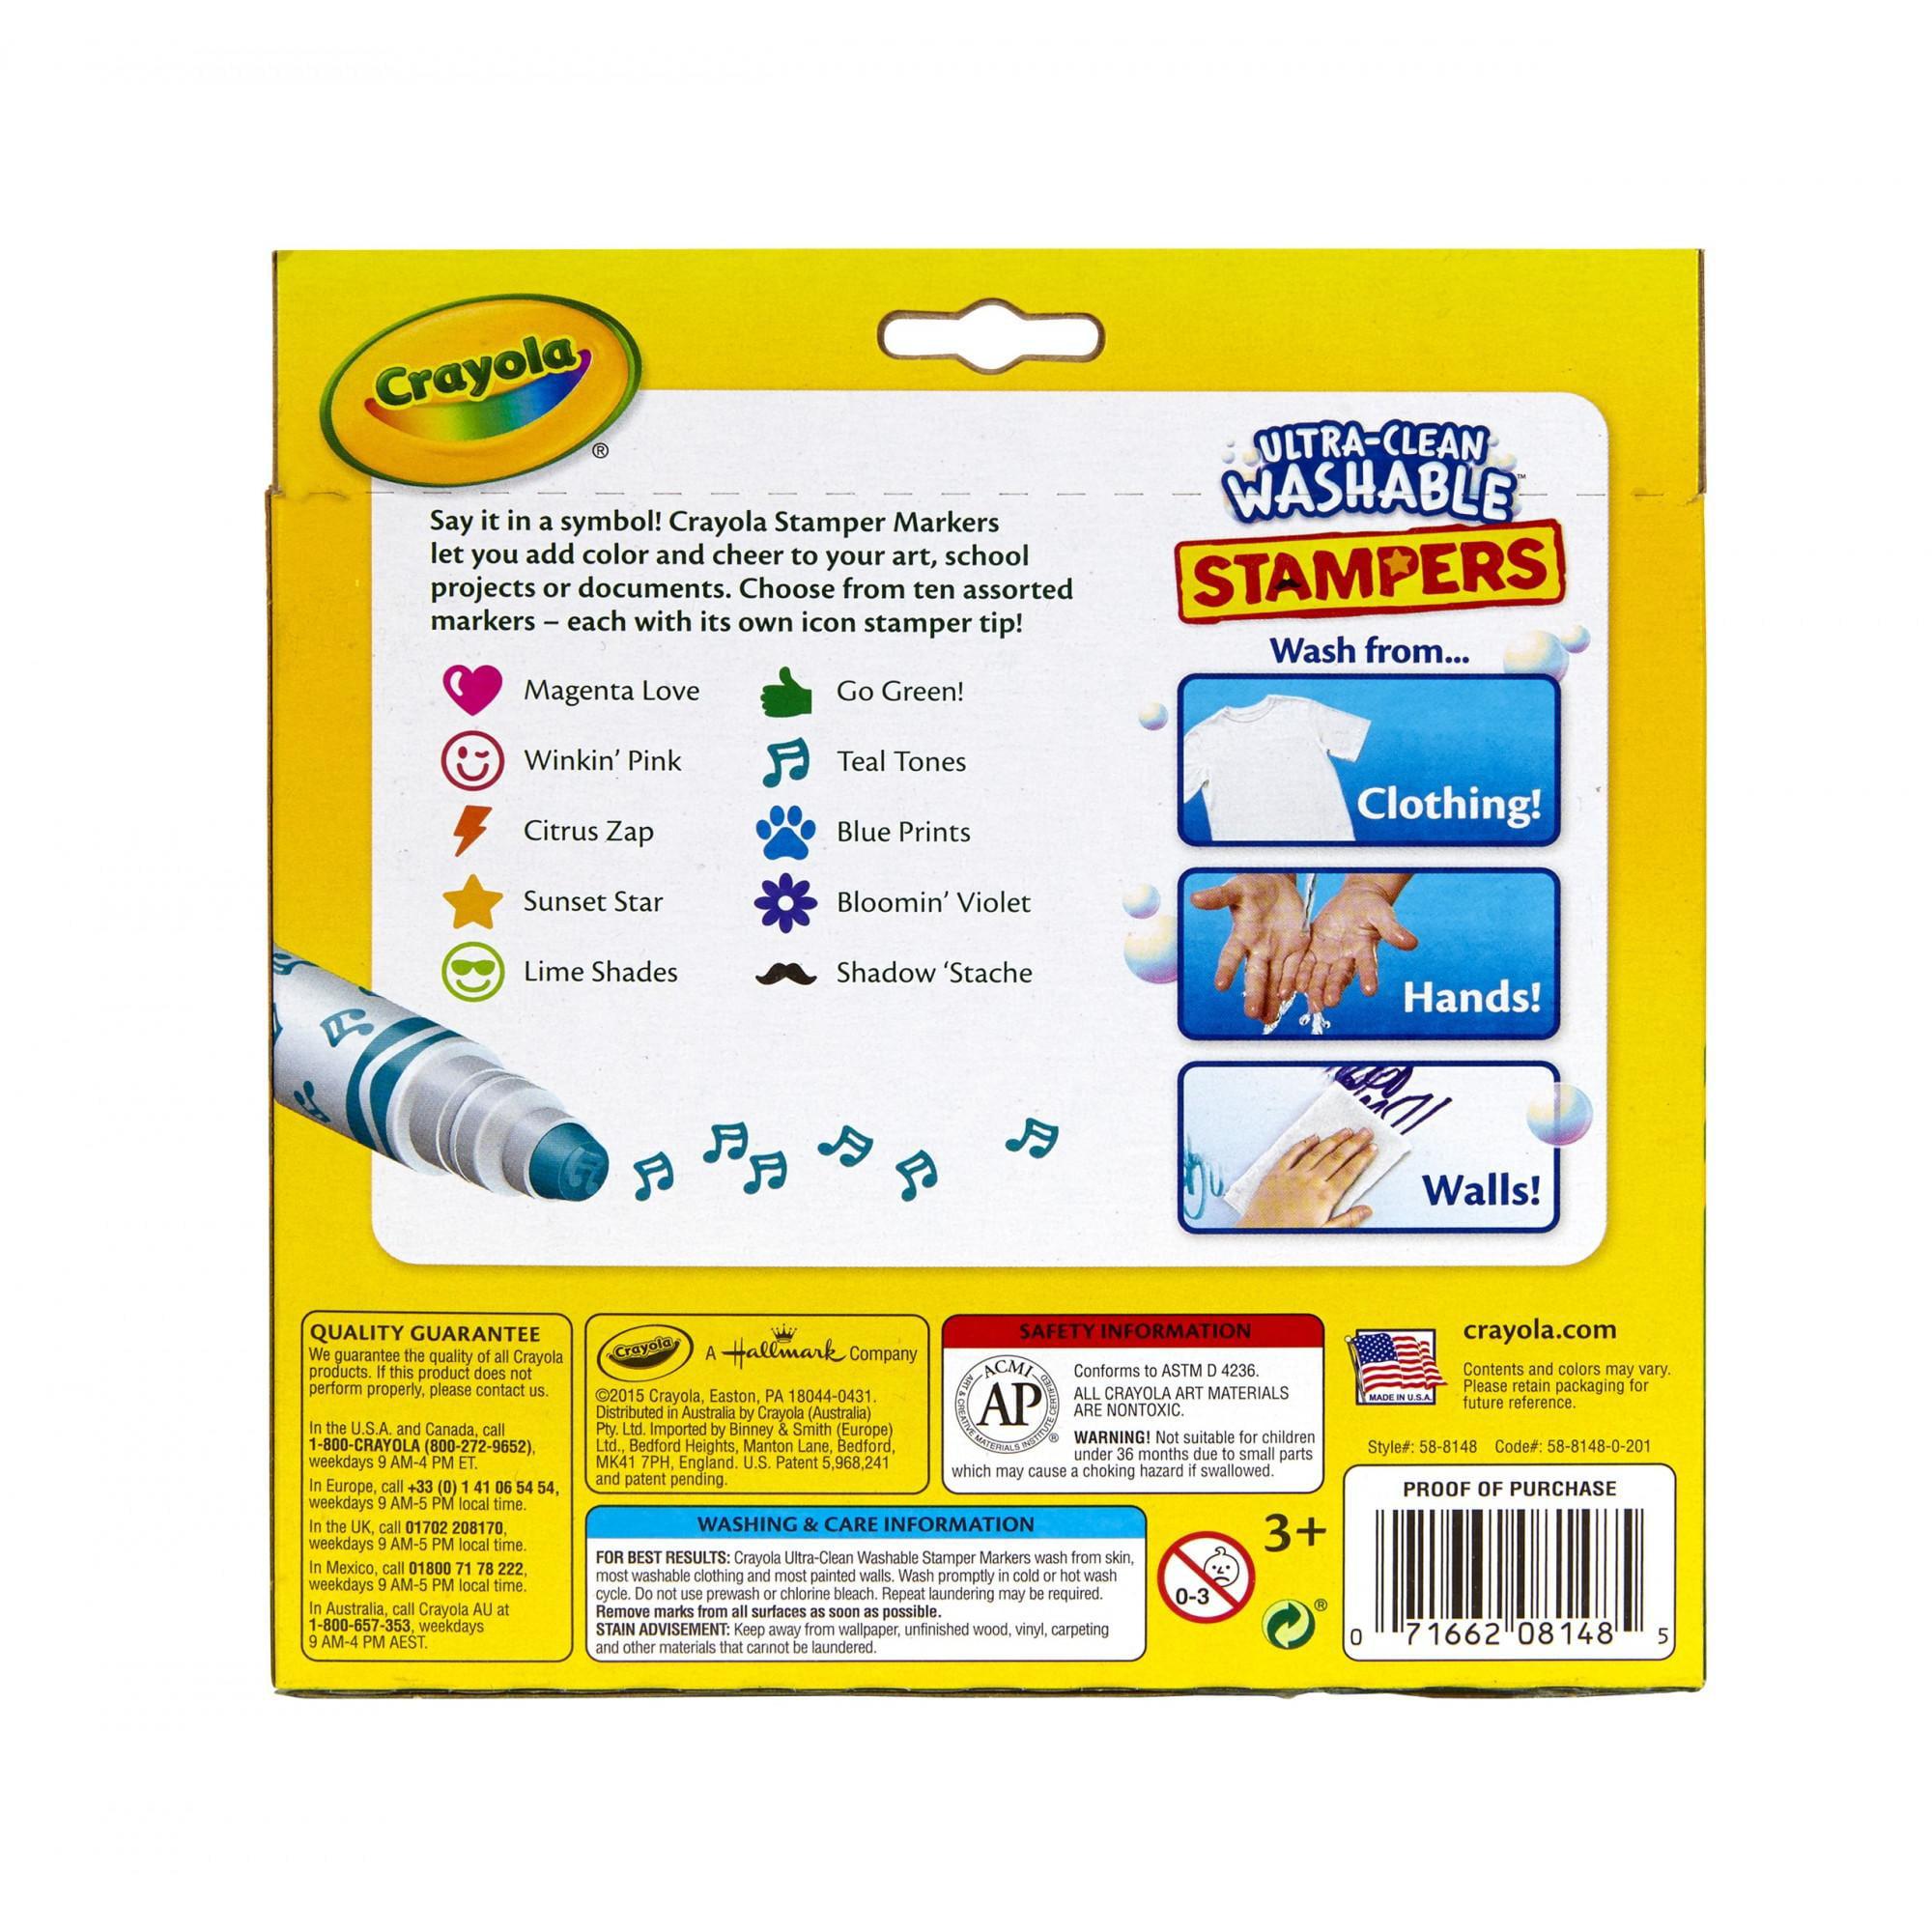 Crayola 10 Count Ultra Clean Washable Stamper Markers Walmart Com Walmart Com